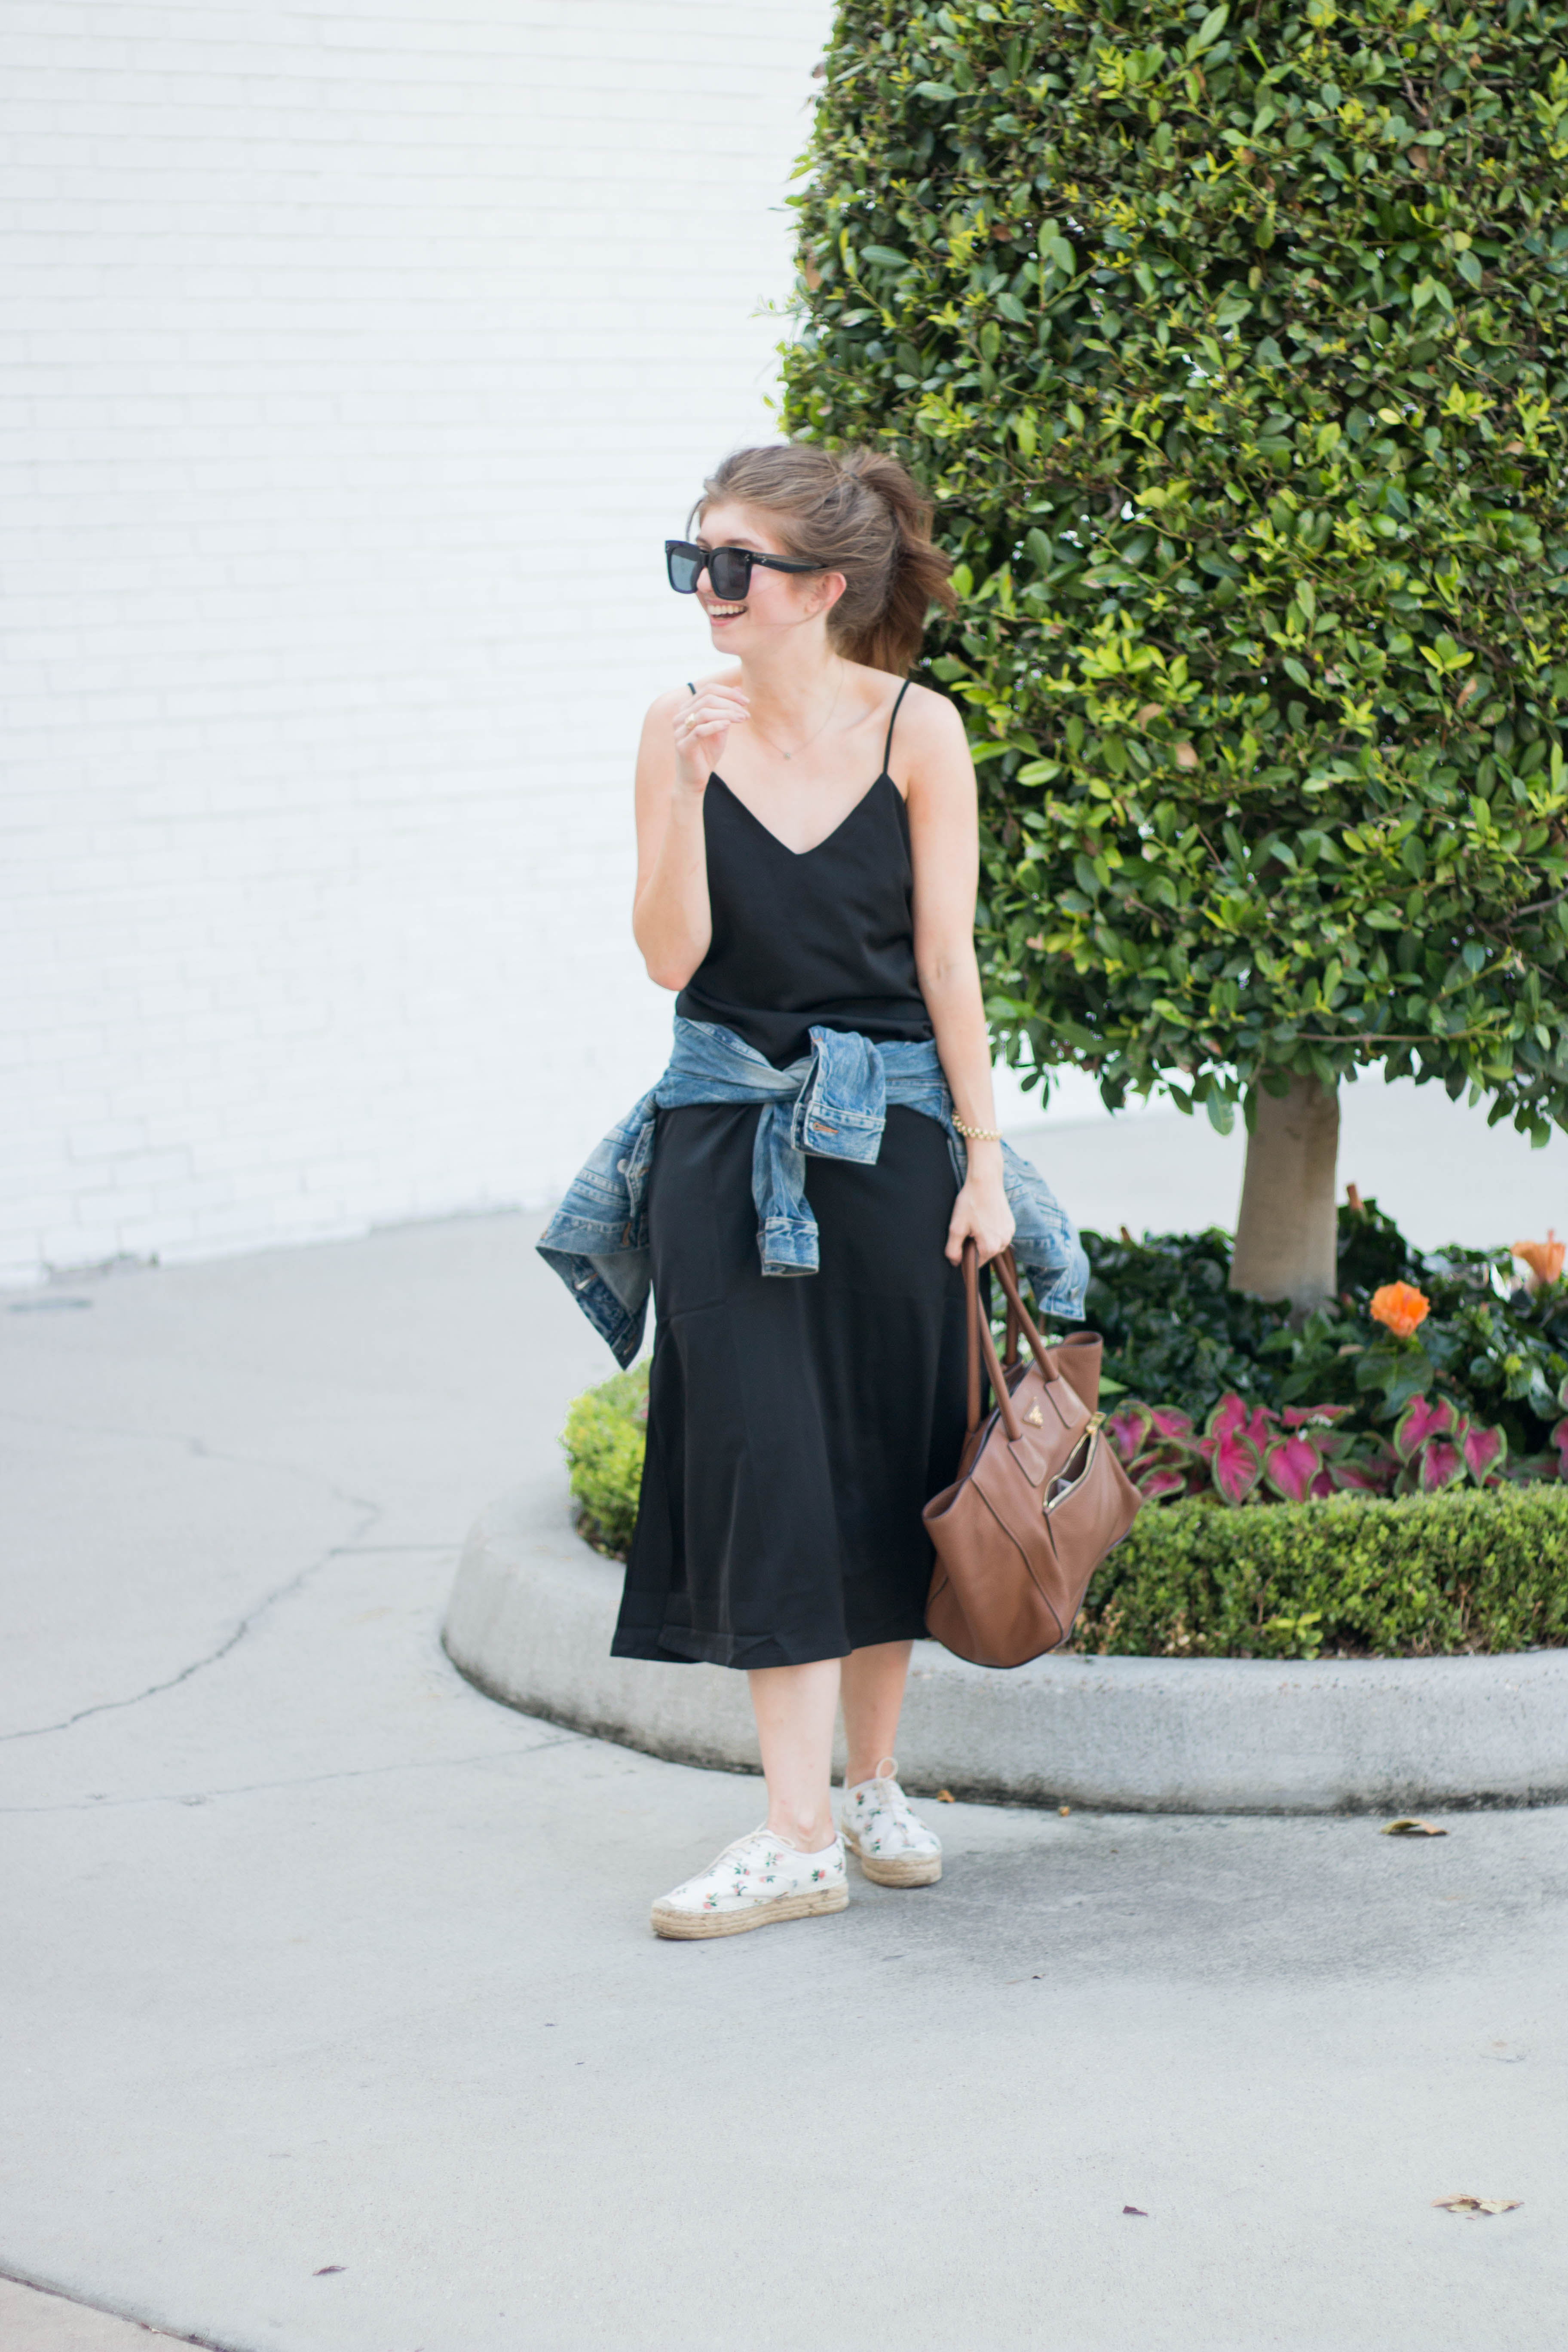 black slip dress - slip dress with denim jacket